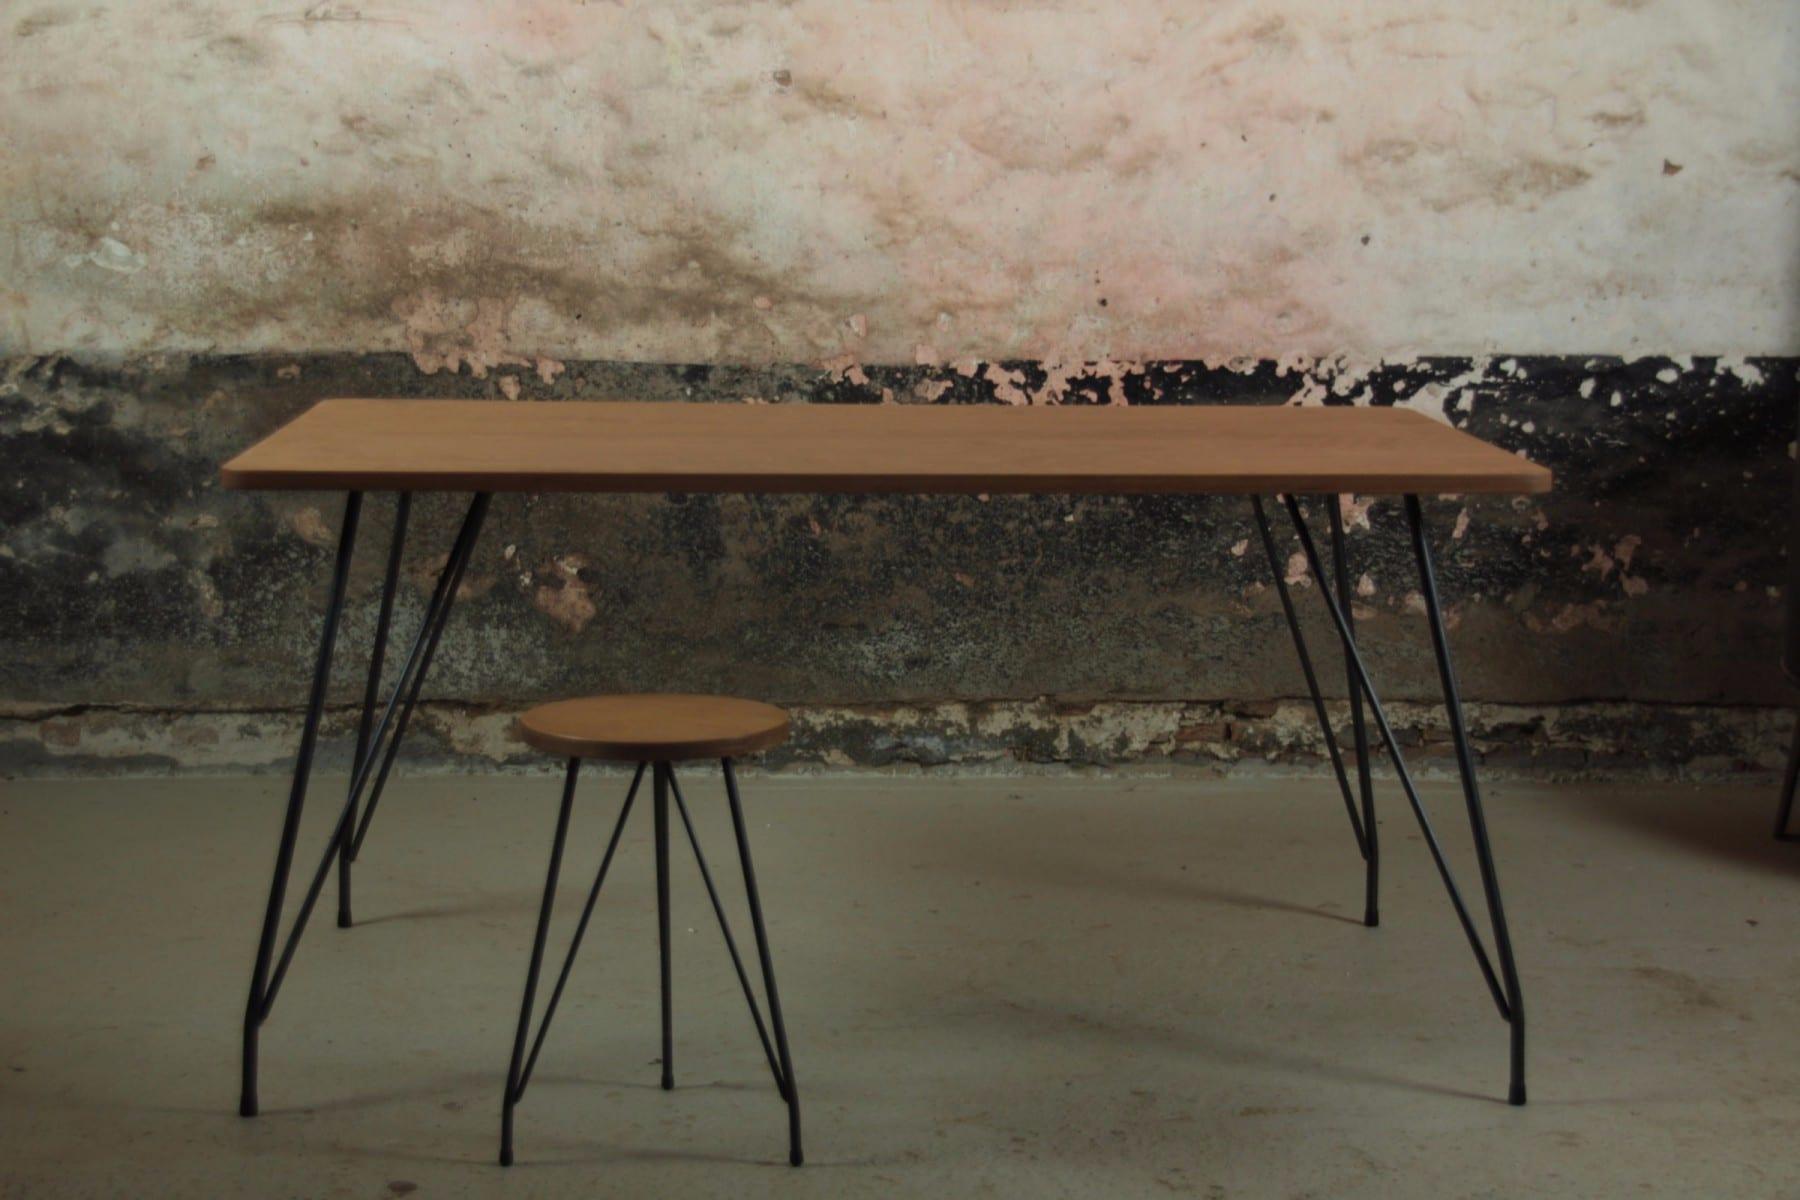 Industri le horeca inrichting meubelmakerij houtkwadraat for Horeca tafels